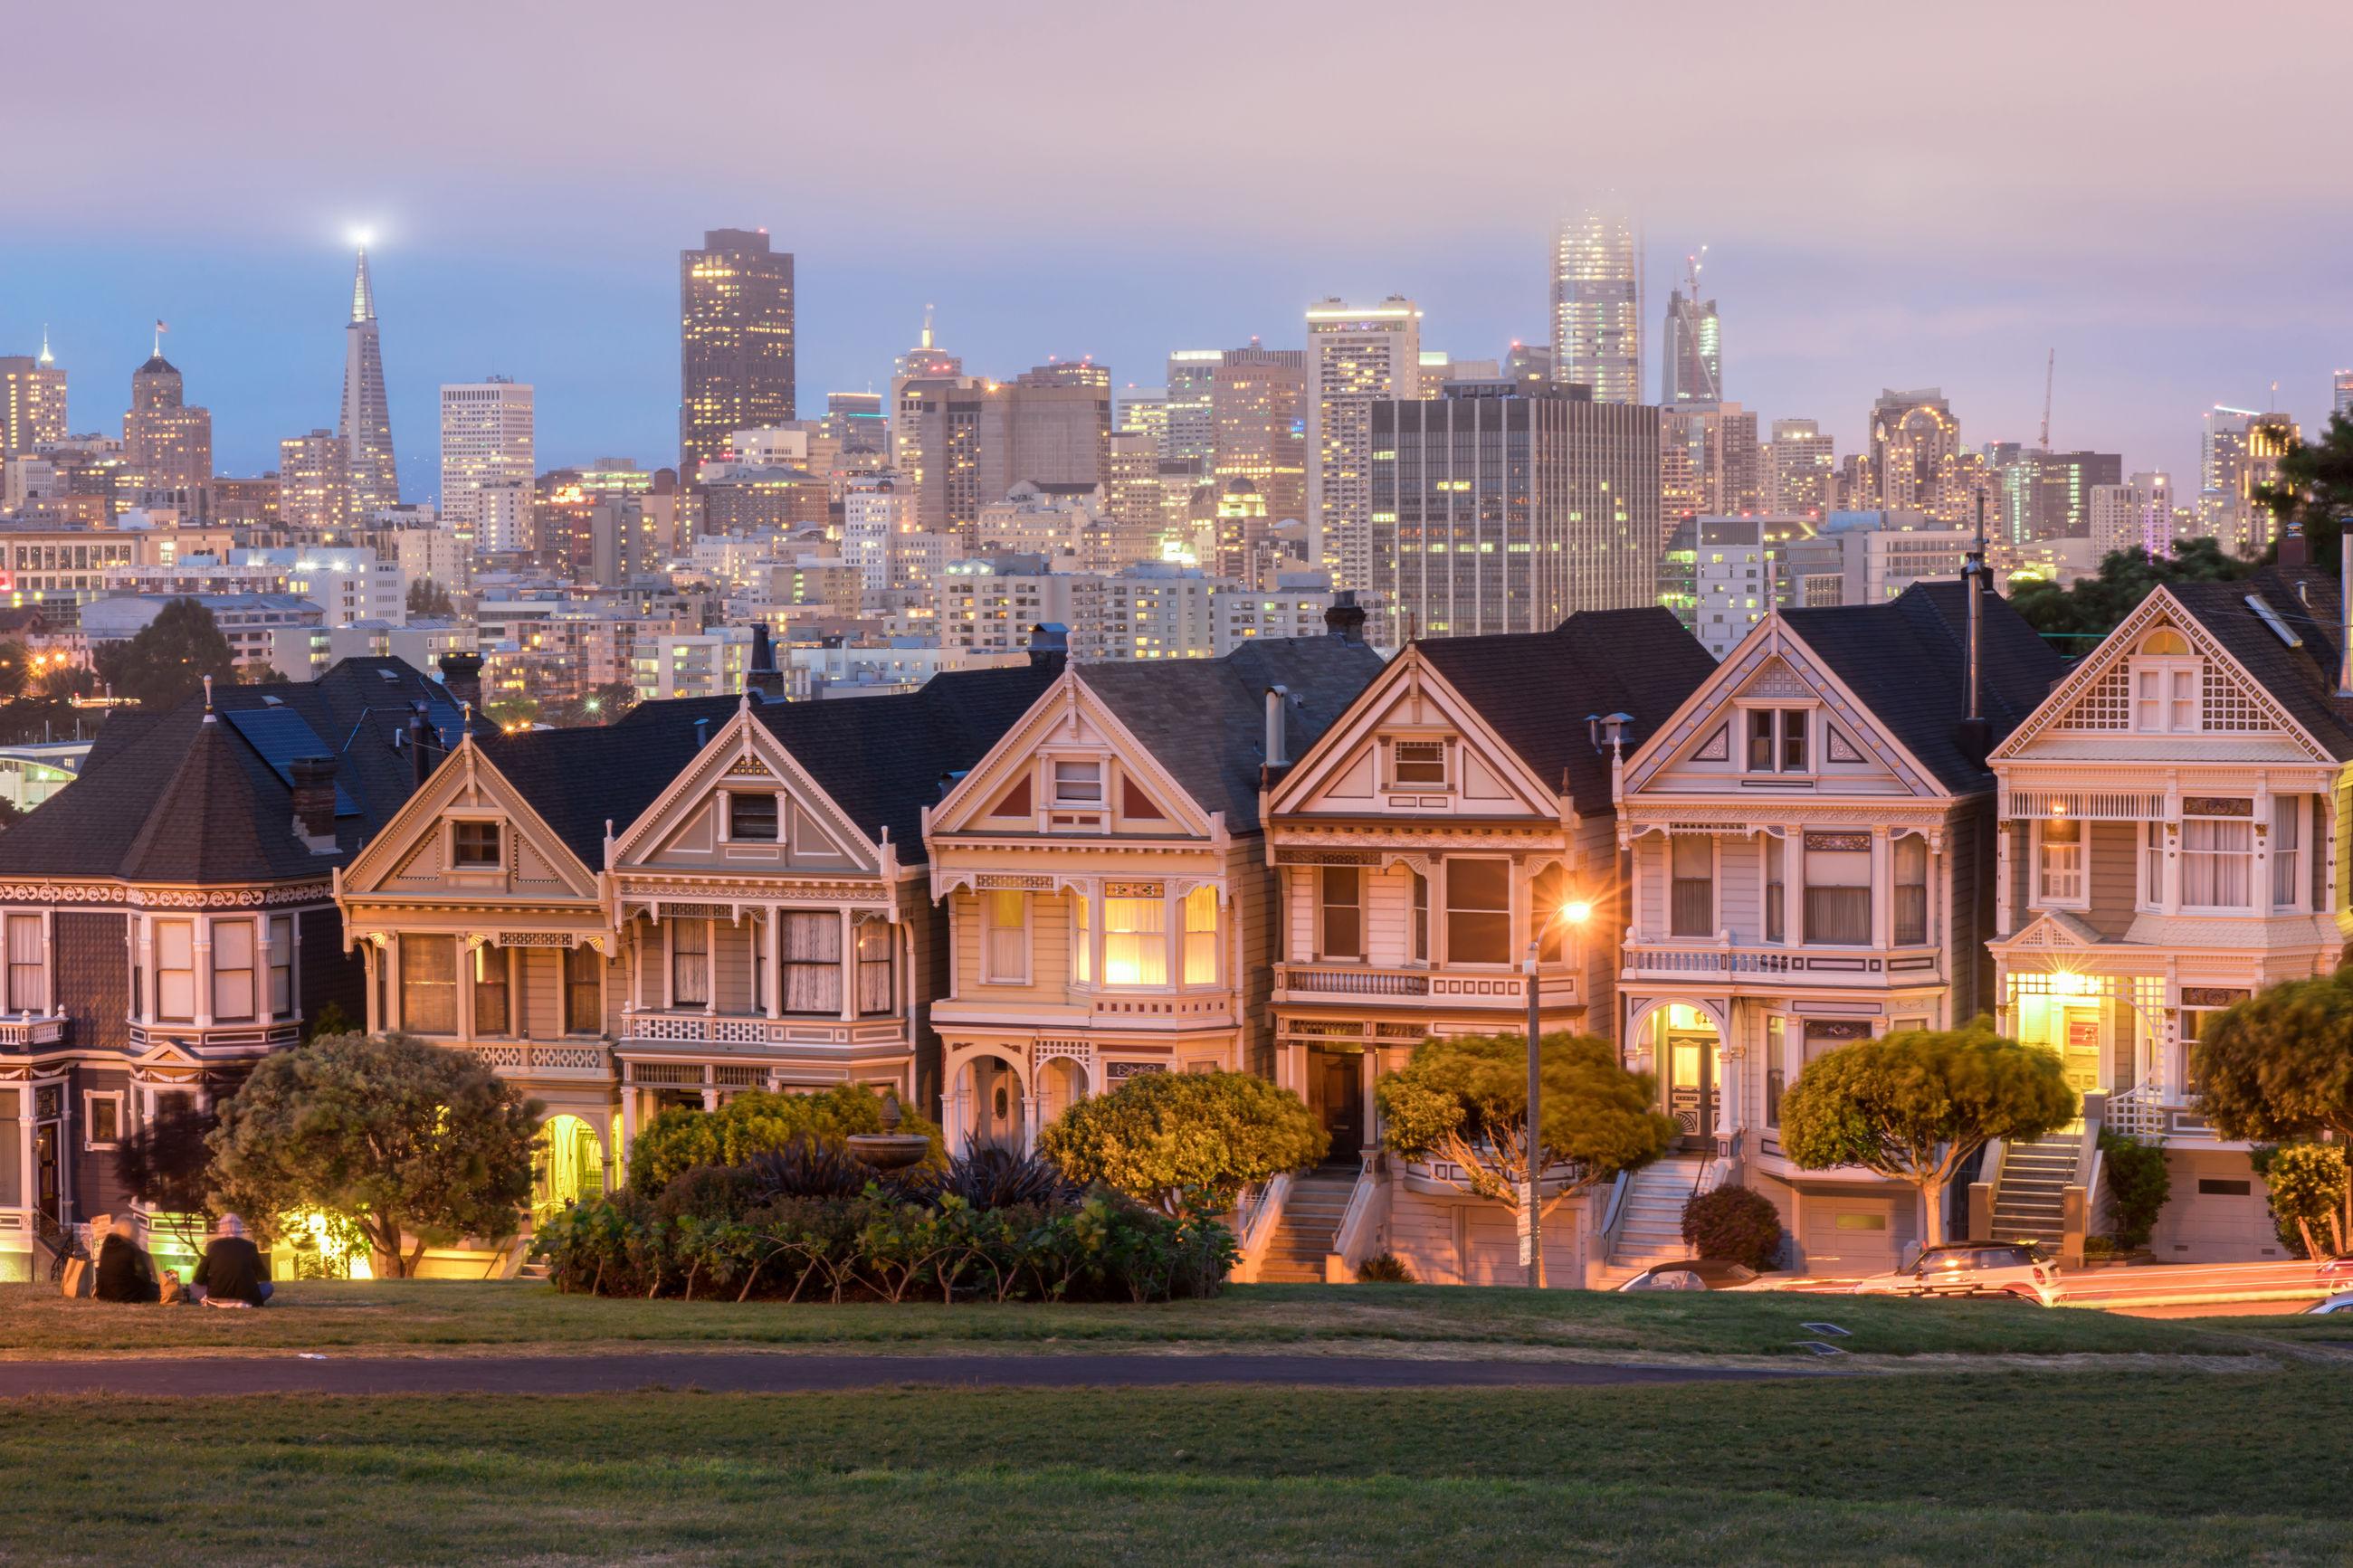 Illuminated buildings in city at dusk